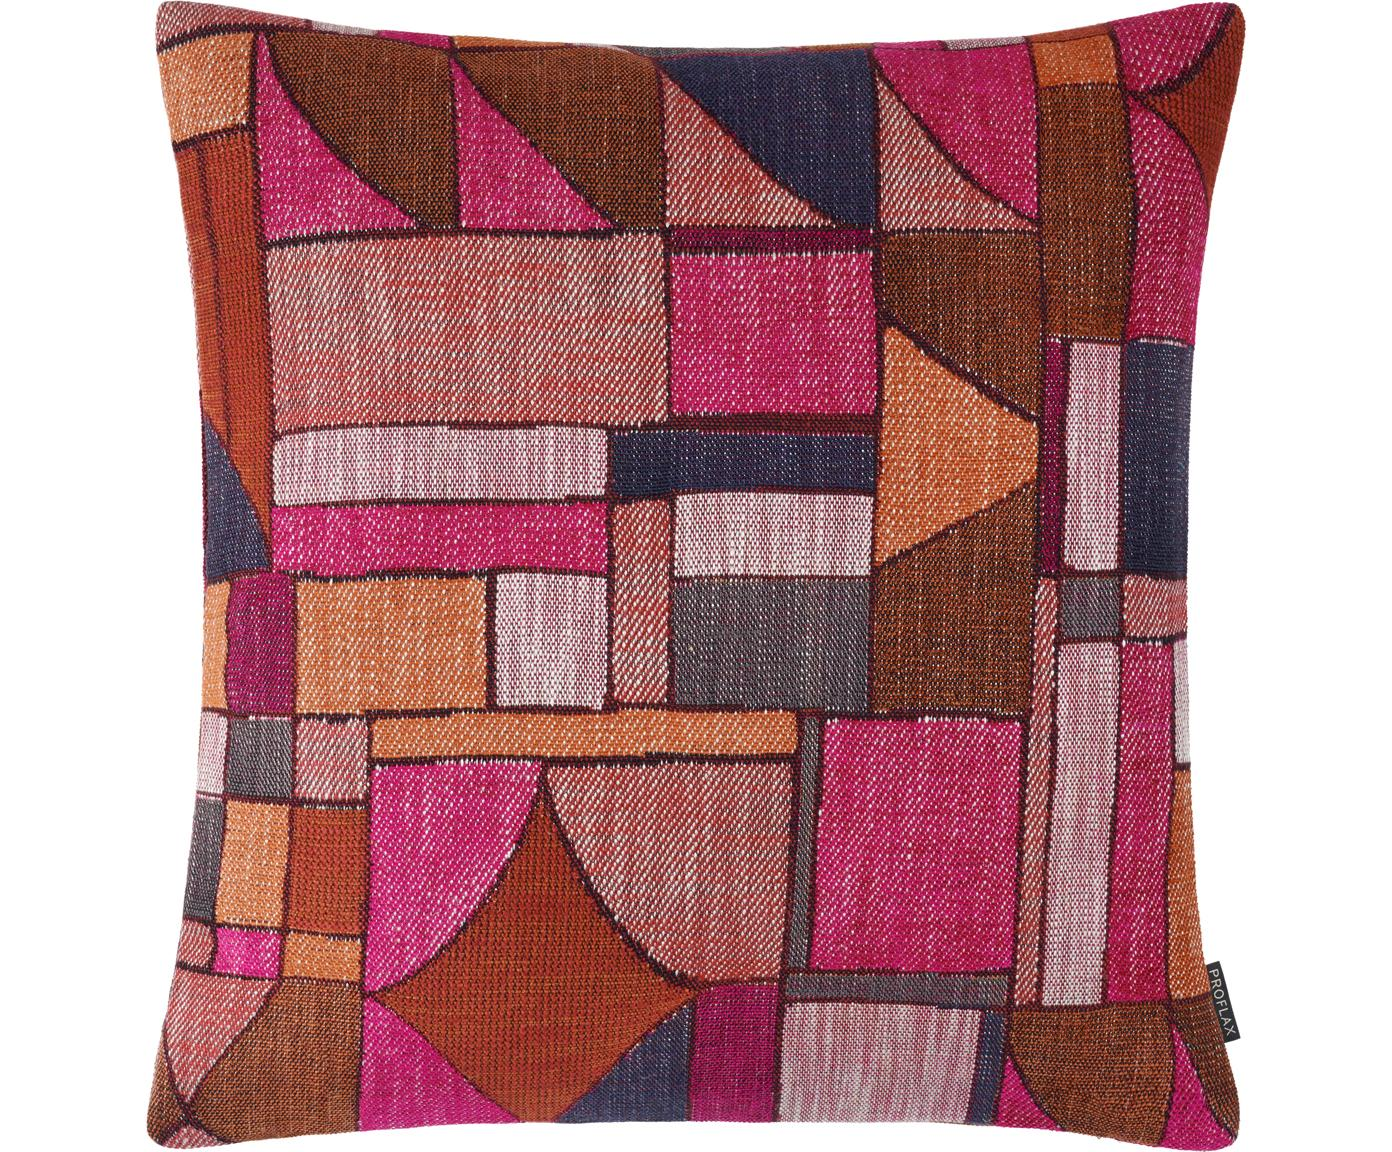 Kissenhülle Morris mit abstraktem Muster, 64% Viskose, 19% Baumwolle, 11% Leinen, 6% Polyester, Rosa, Mehrfarbig, 40 x 40 cm